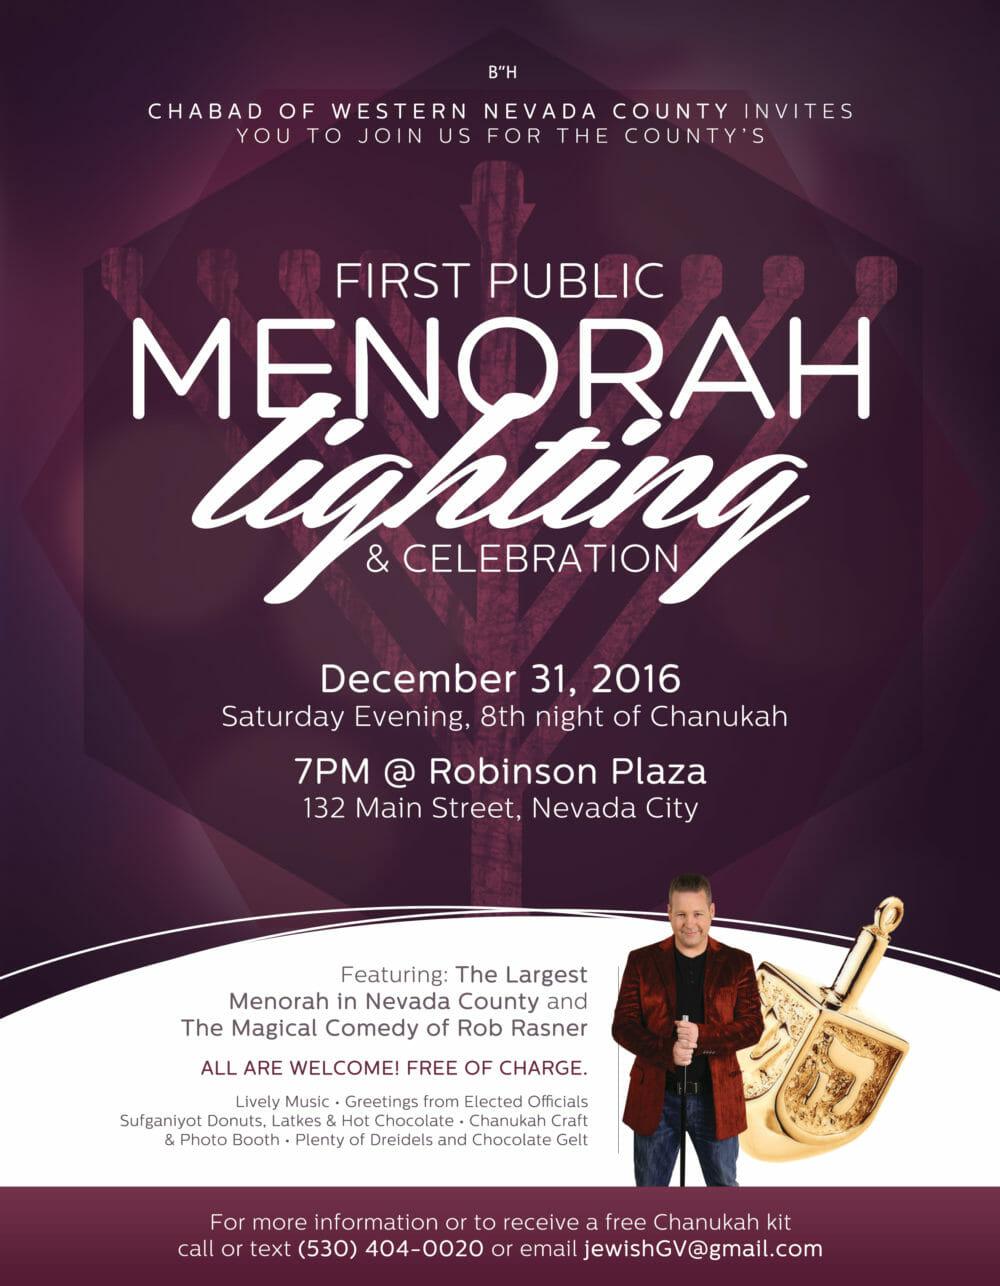 Public Menorah Lighting on New Year's Eve in Nevada City